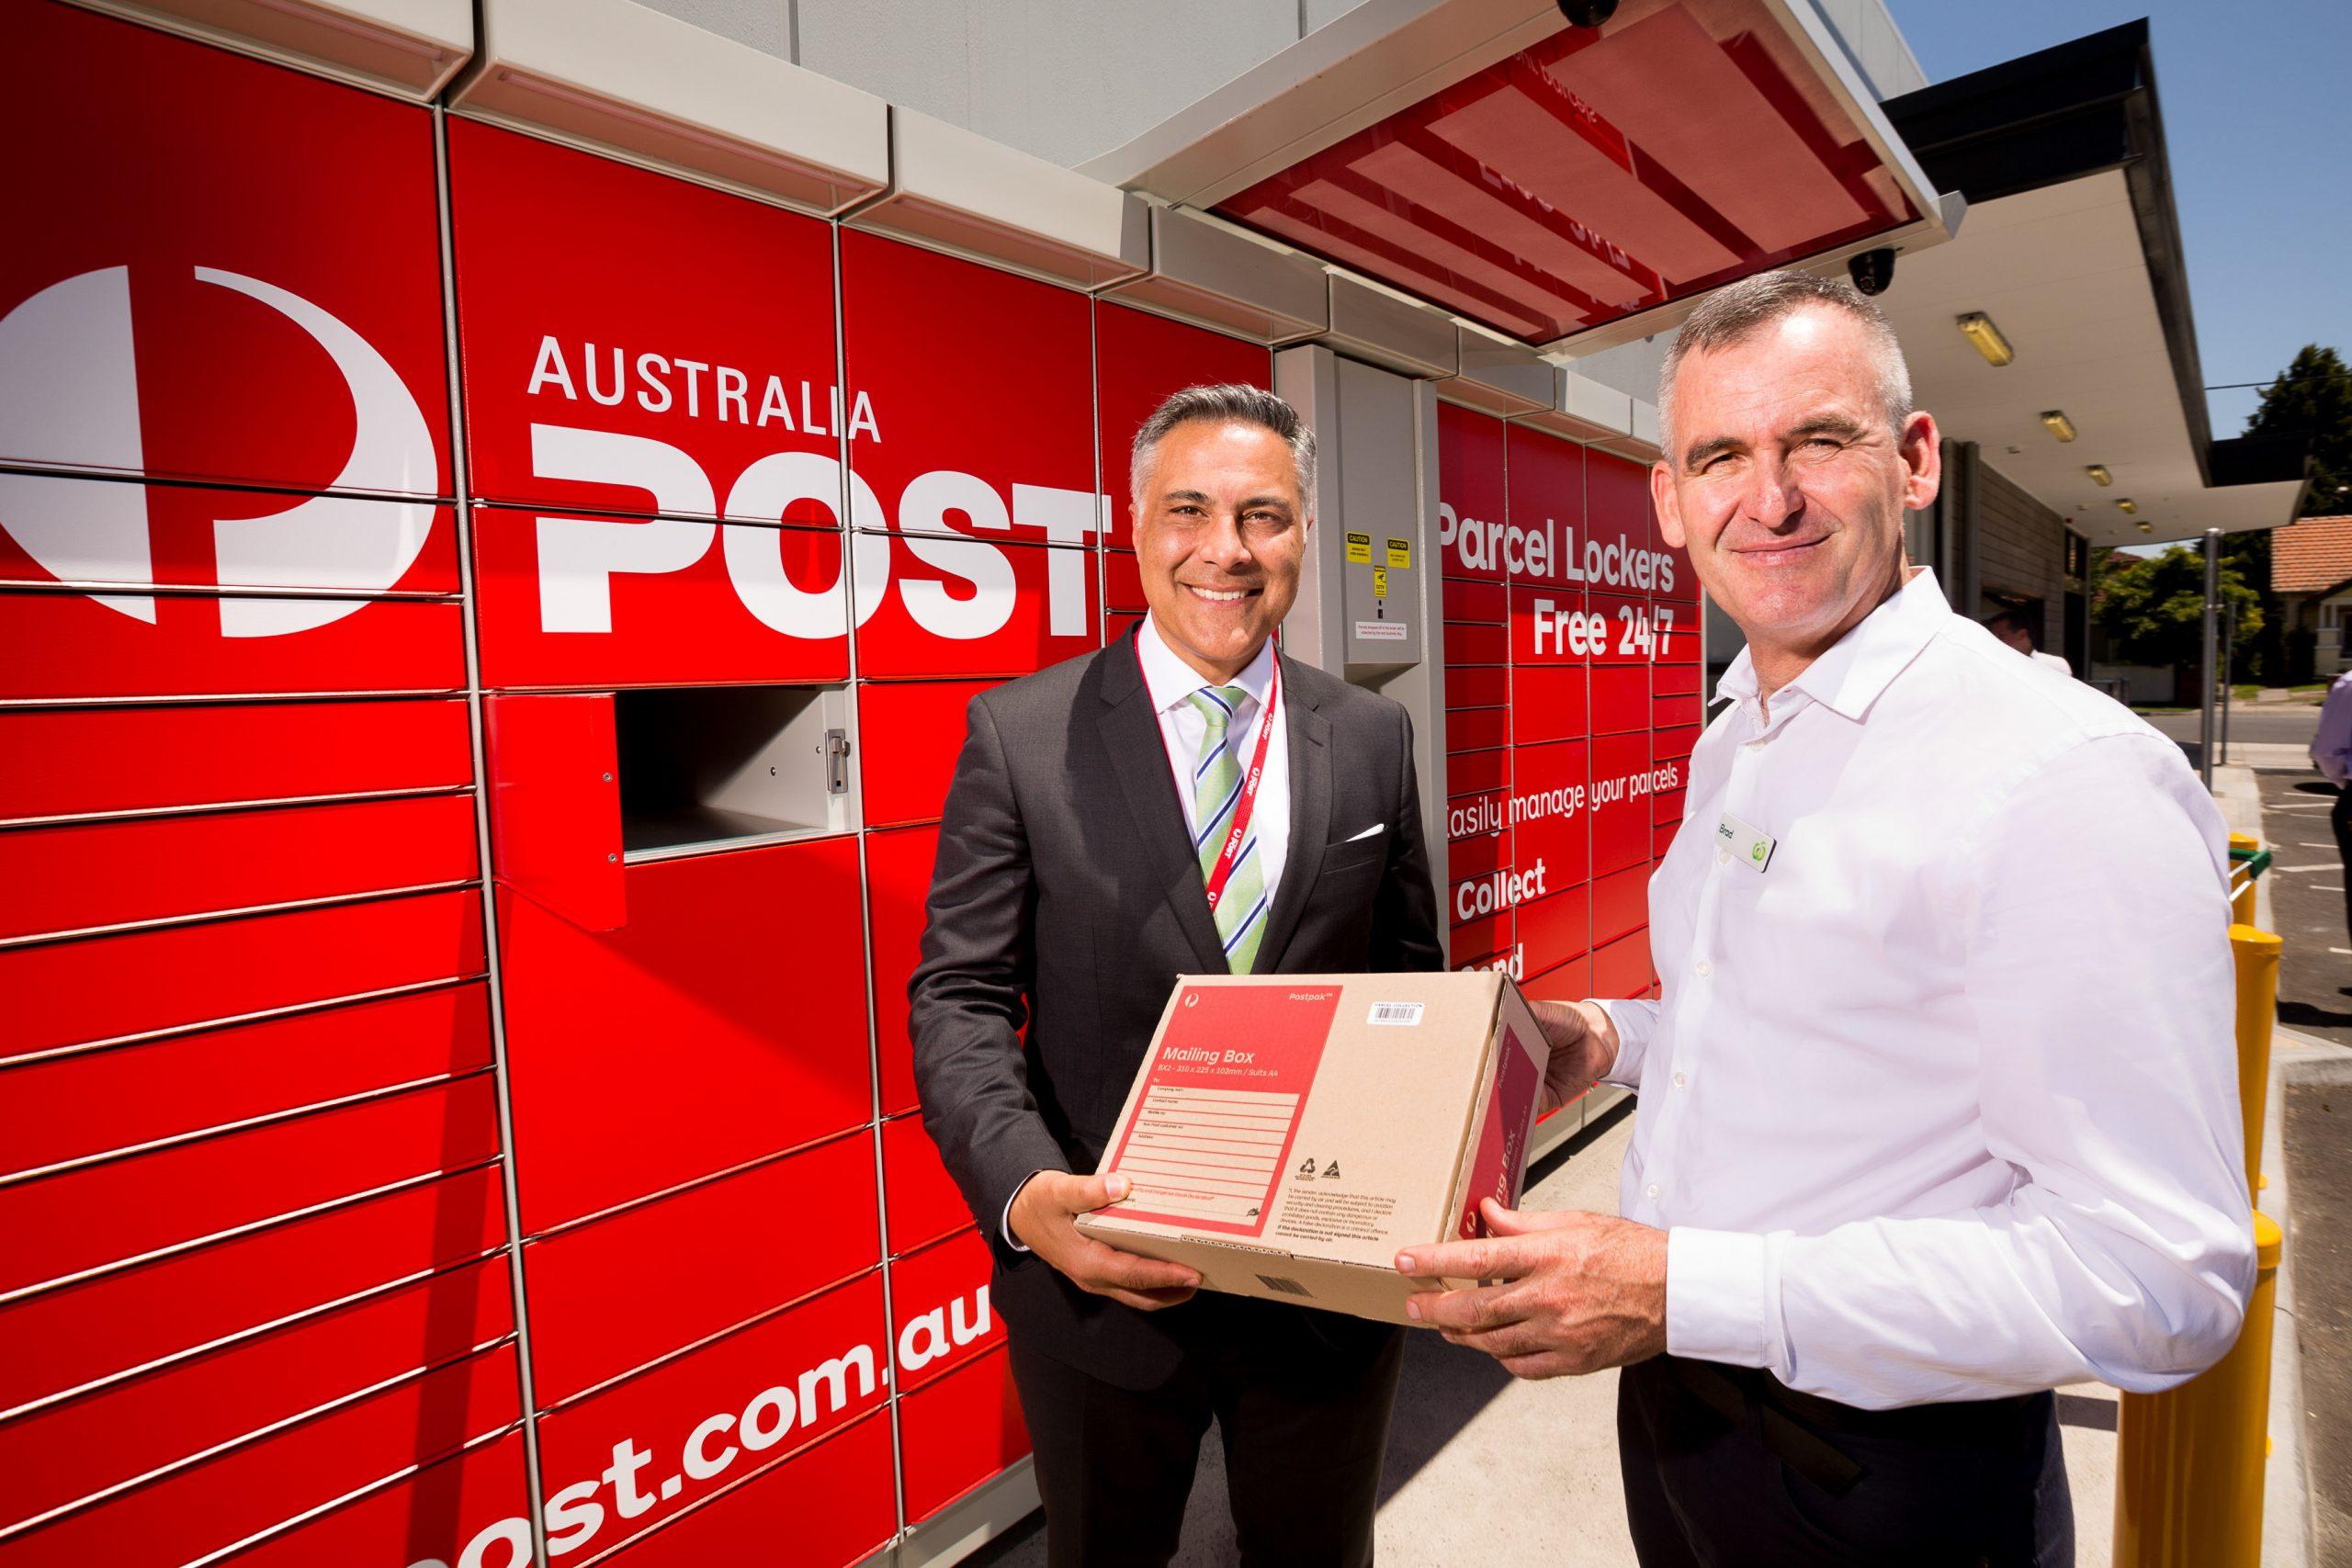 Australia Post installing parcel lockers in Woolworths stores